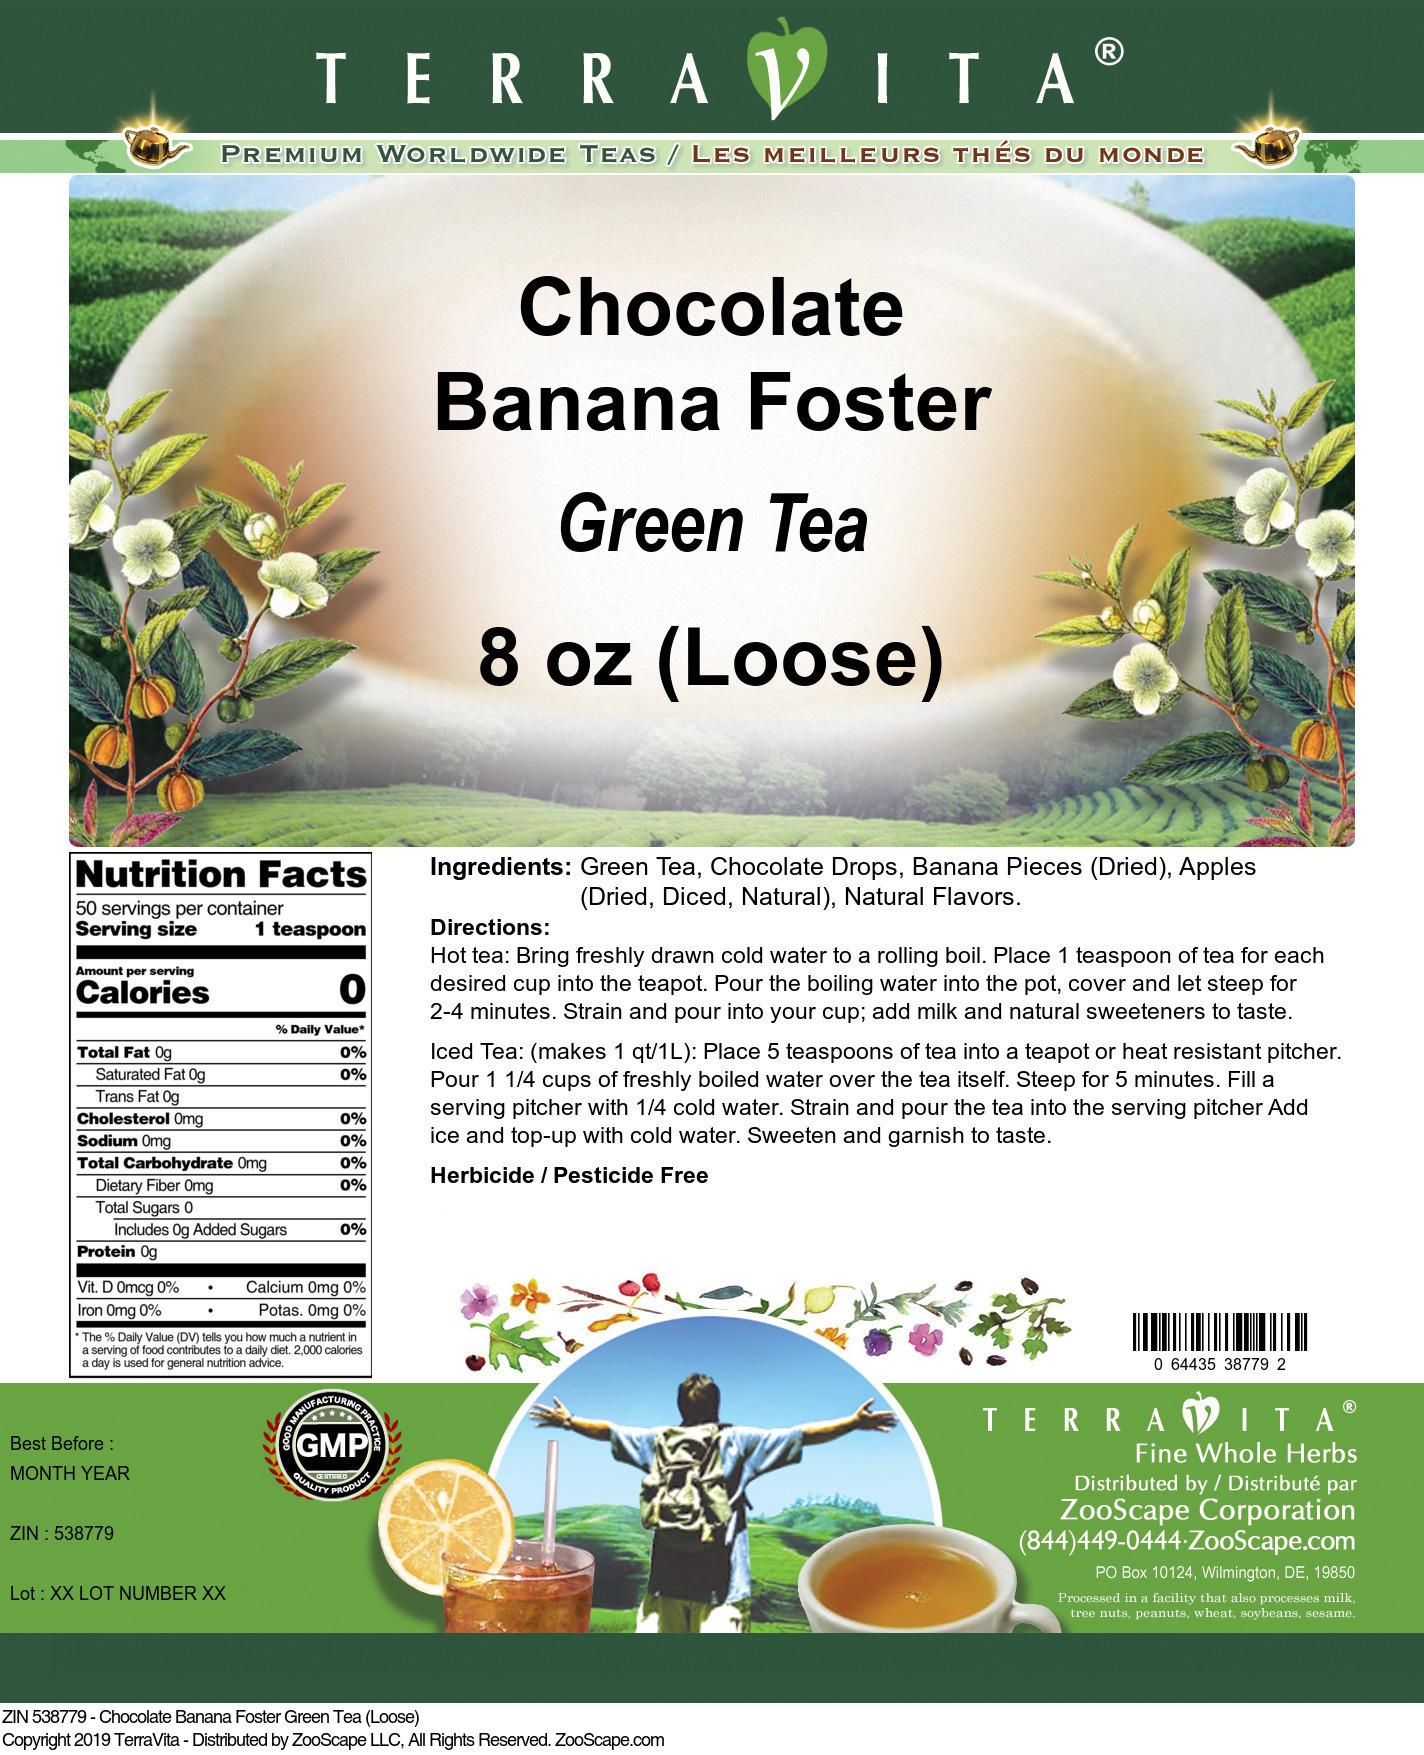 Chocolate Banana Foster Green Tea